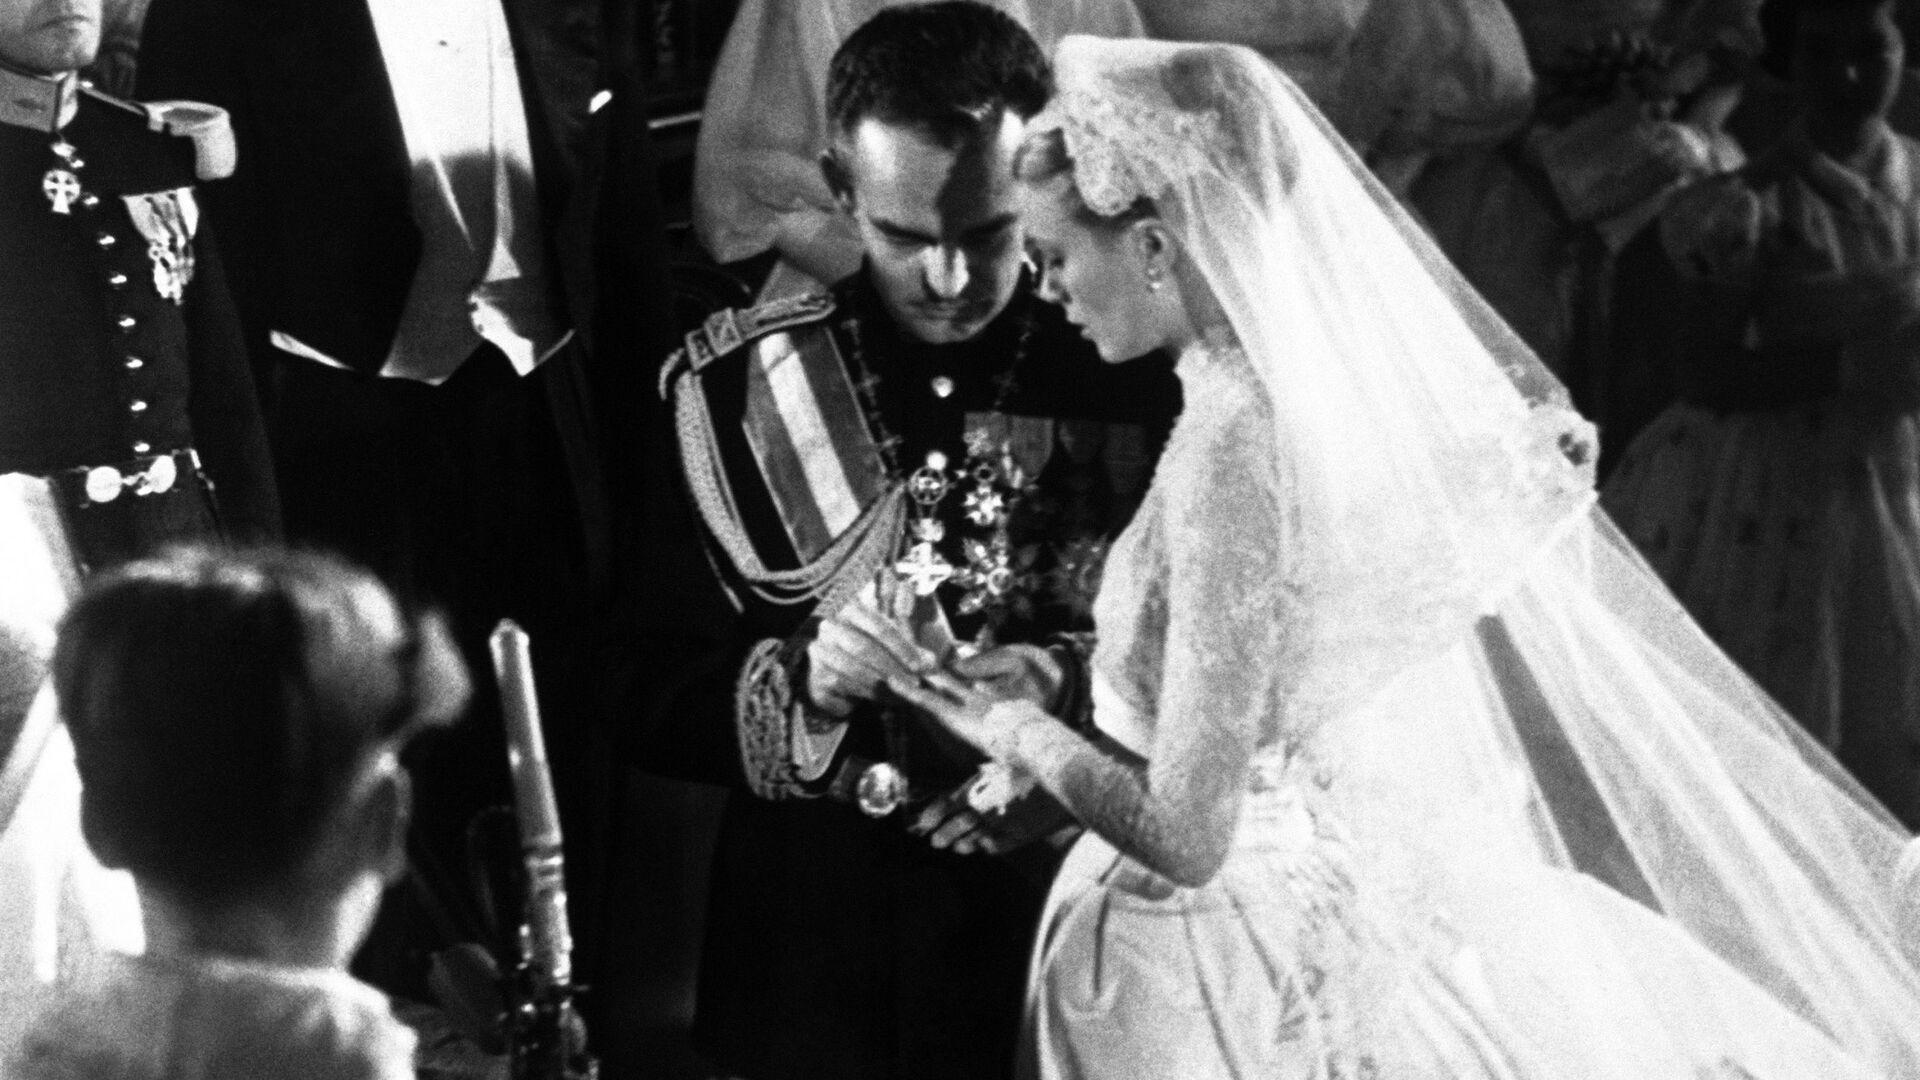 Свадьба Грейс Келли и князя Монако Ренье III. 19 апреля 1956 - РИА Новости, 1920, 18.04.2021